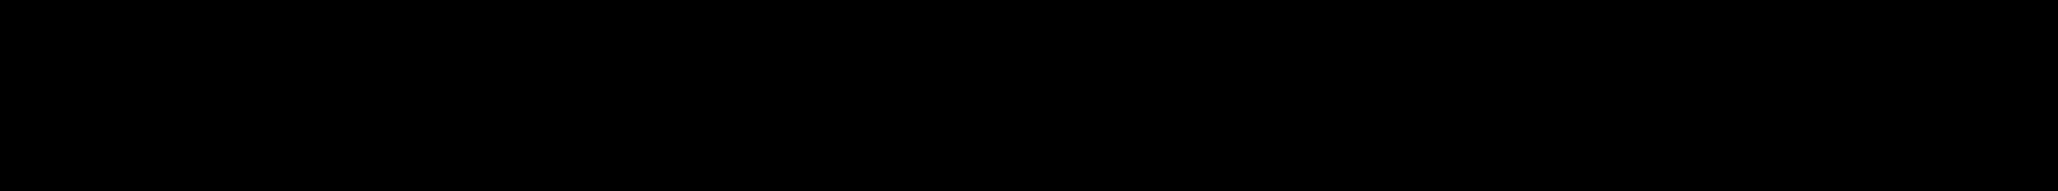 Design System B 700R